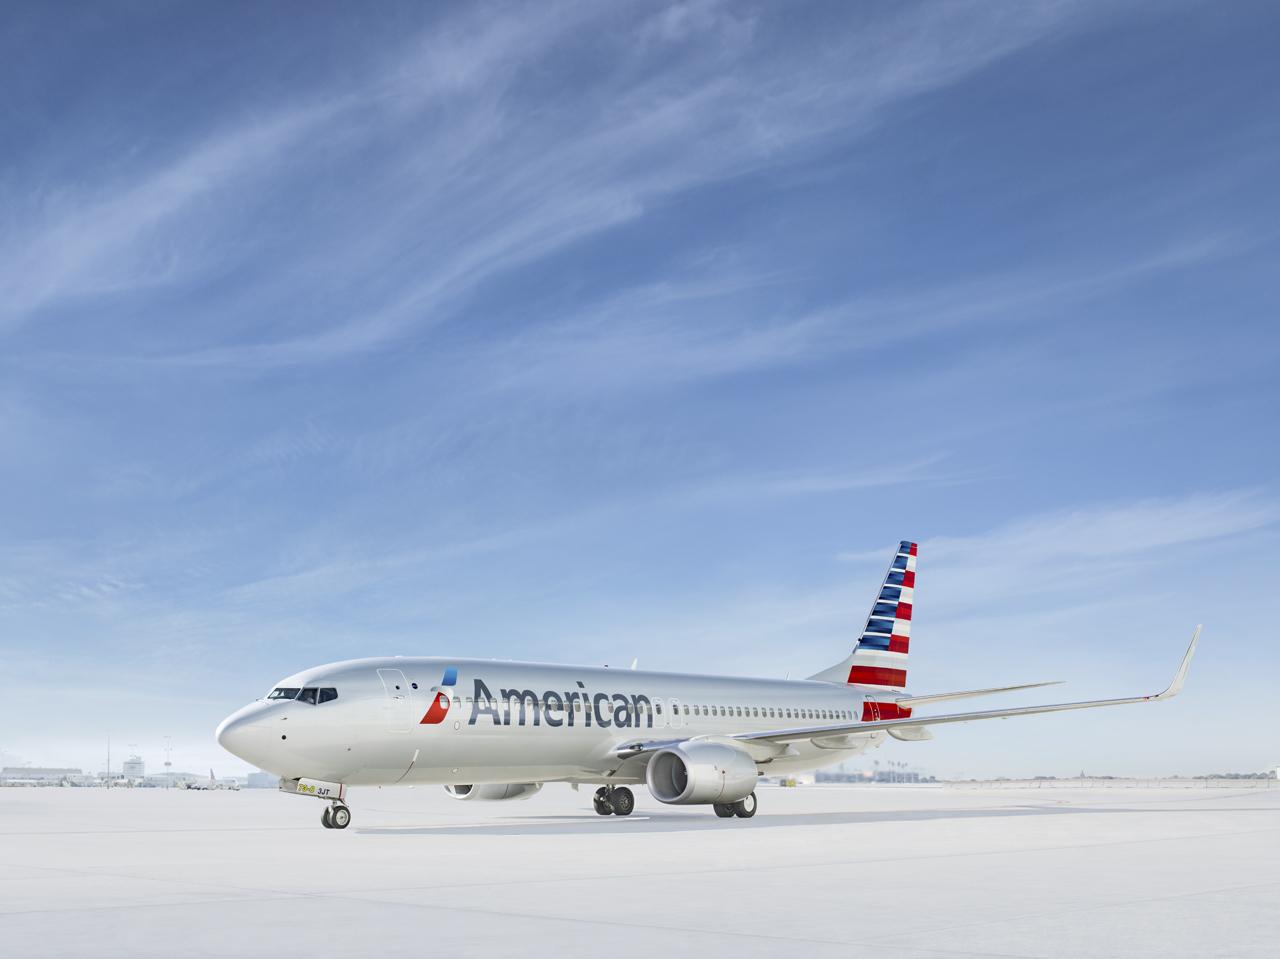 Airline-American Airlines Boeing 737-AAL-BA